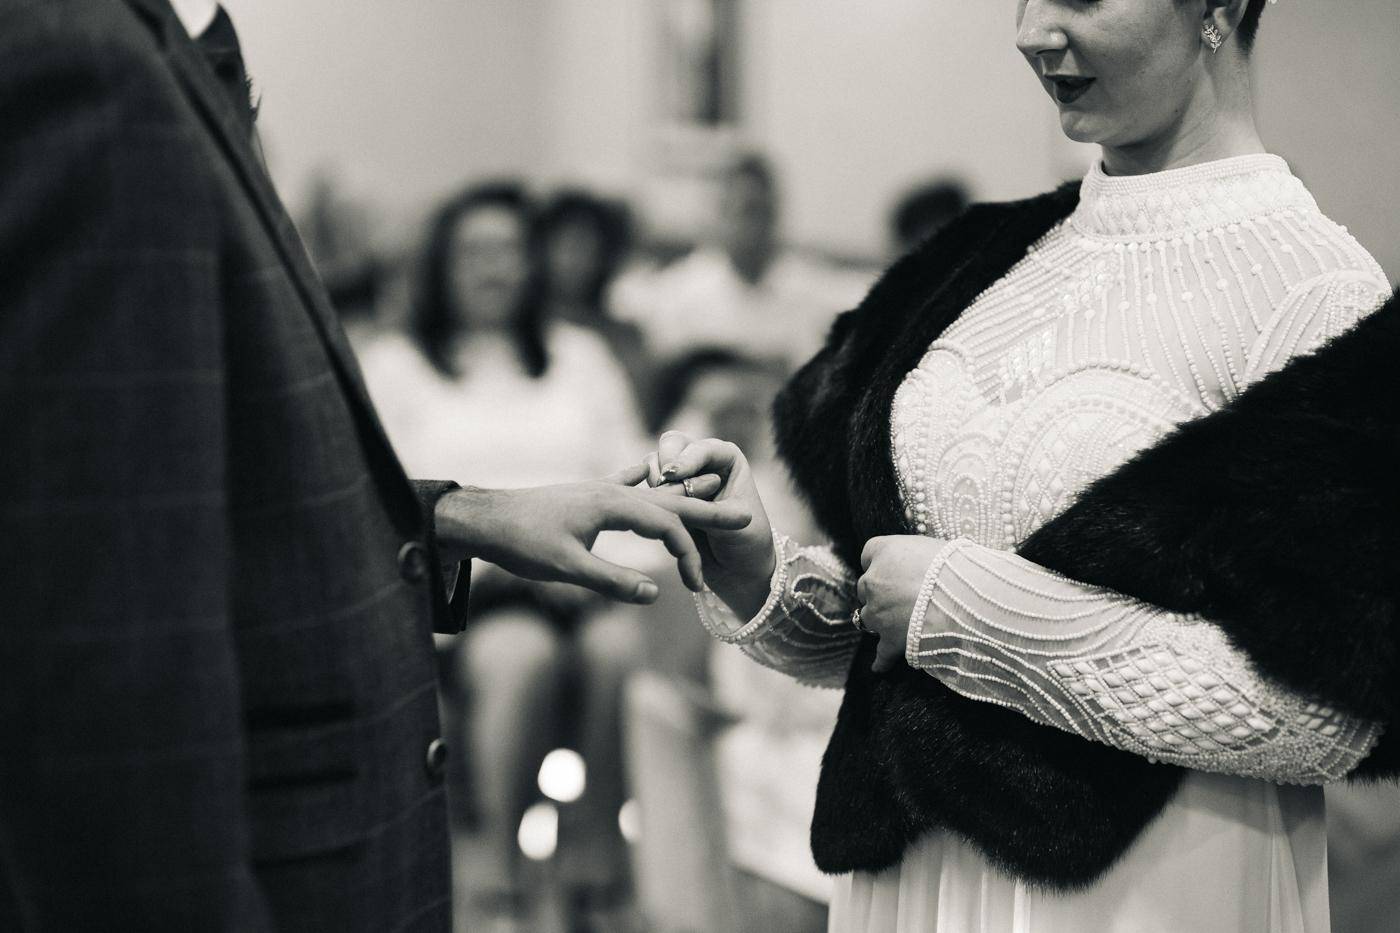 teesside-newcastle-gateshead-wedding-photography-photographer-creative-0039.jpg